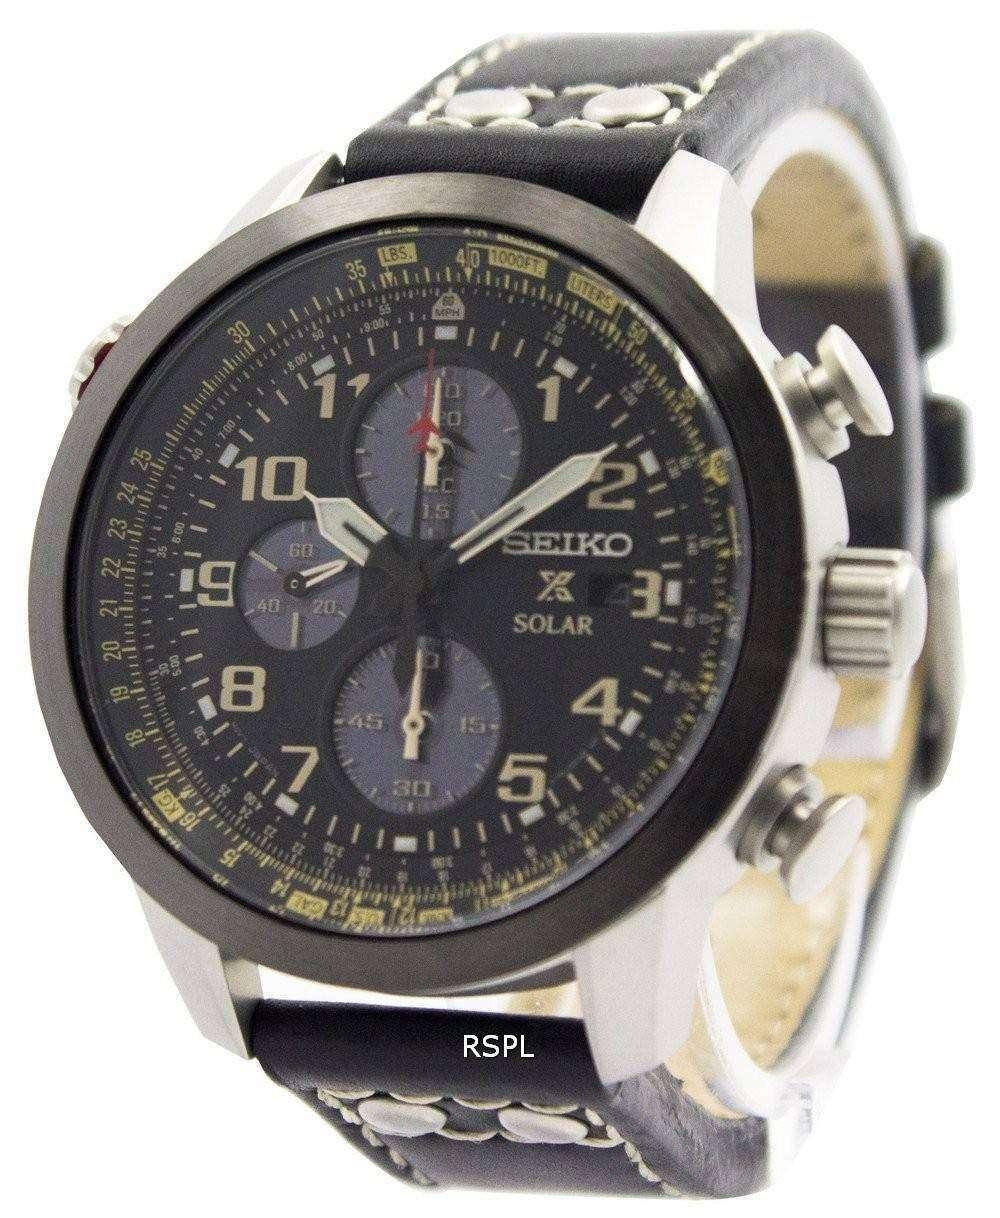 Seiko Prospex Solar Chronograph Ssc423p1 Ssc423p Men S